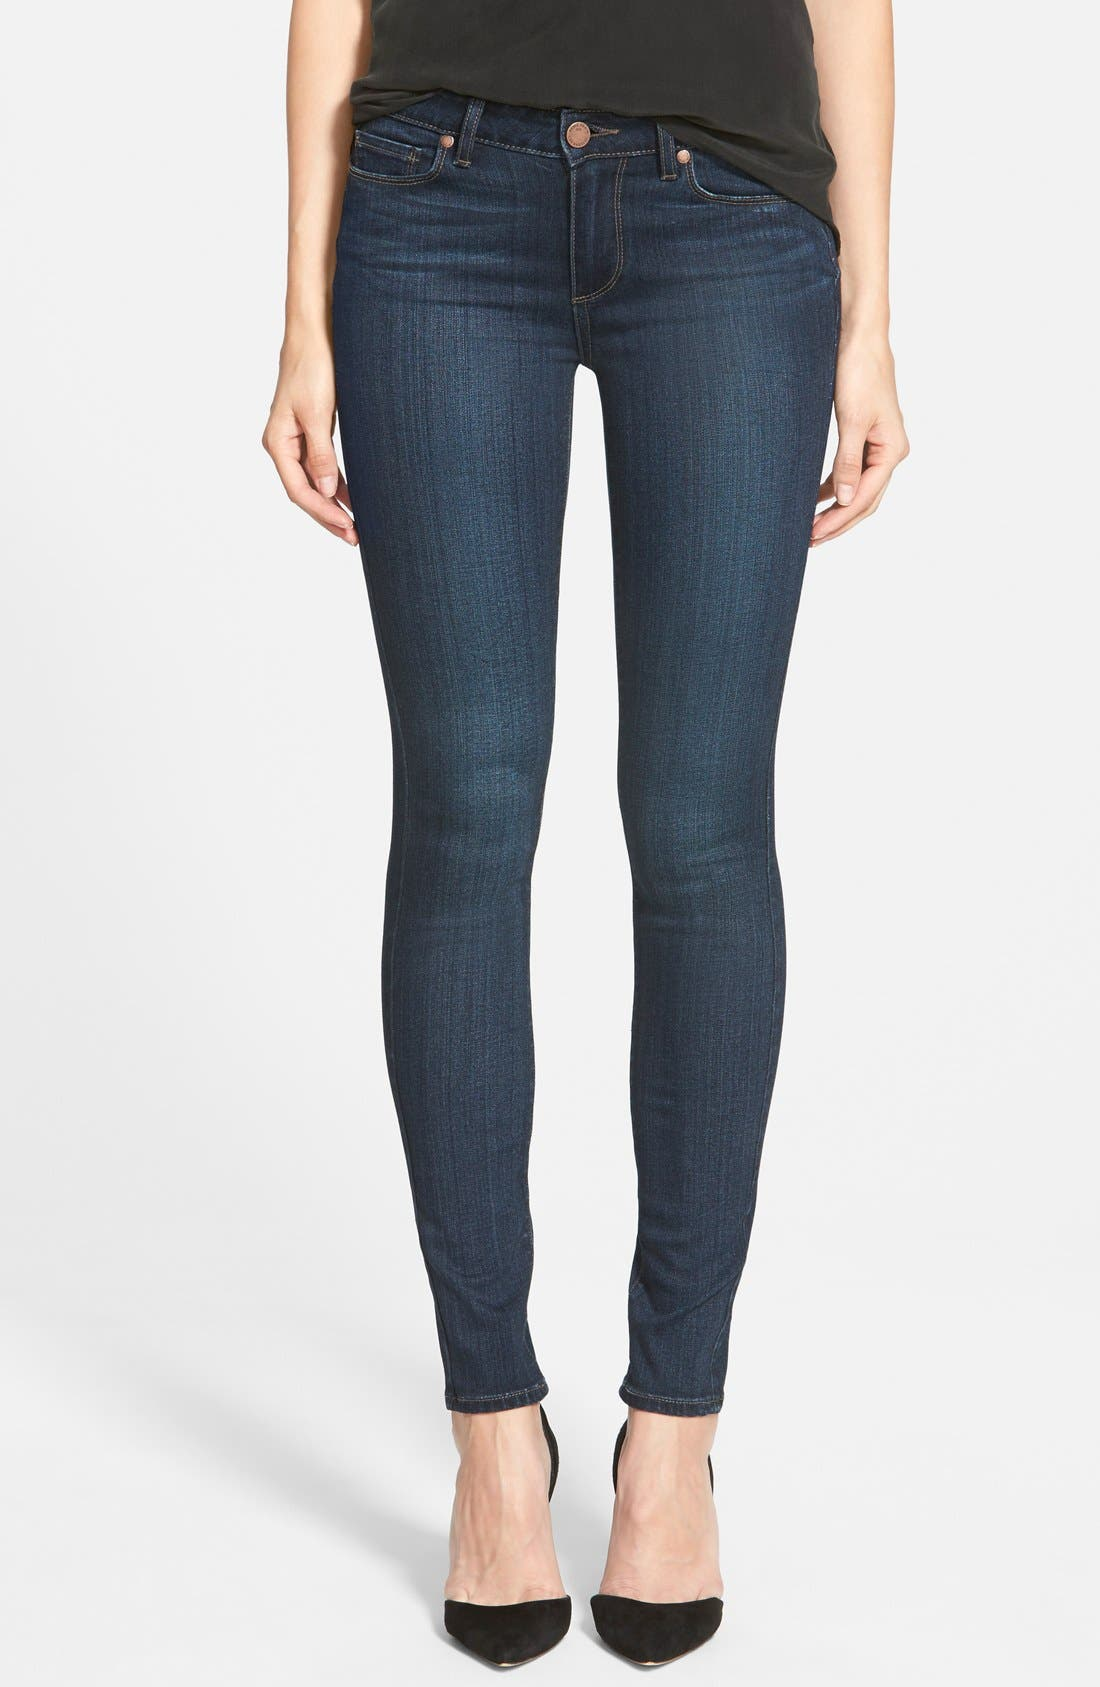 Main Image - PAIGE 'Transcend - Verdugo' Ultra Skinny Jeans (Clark)